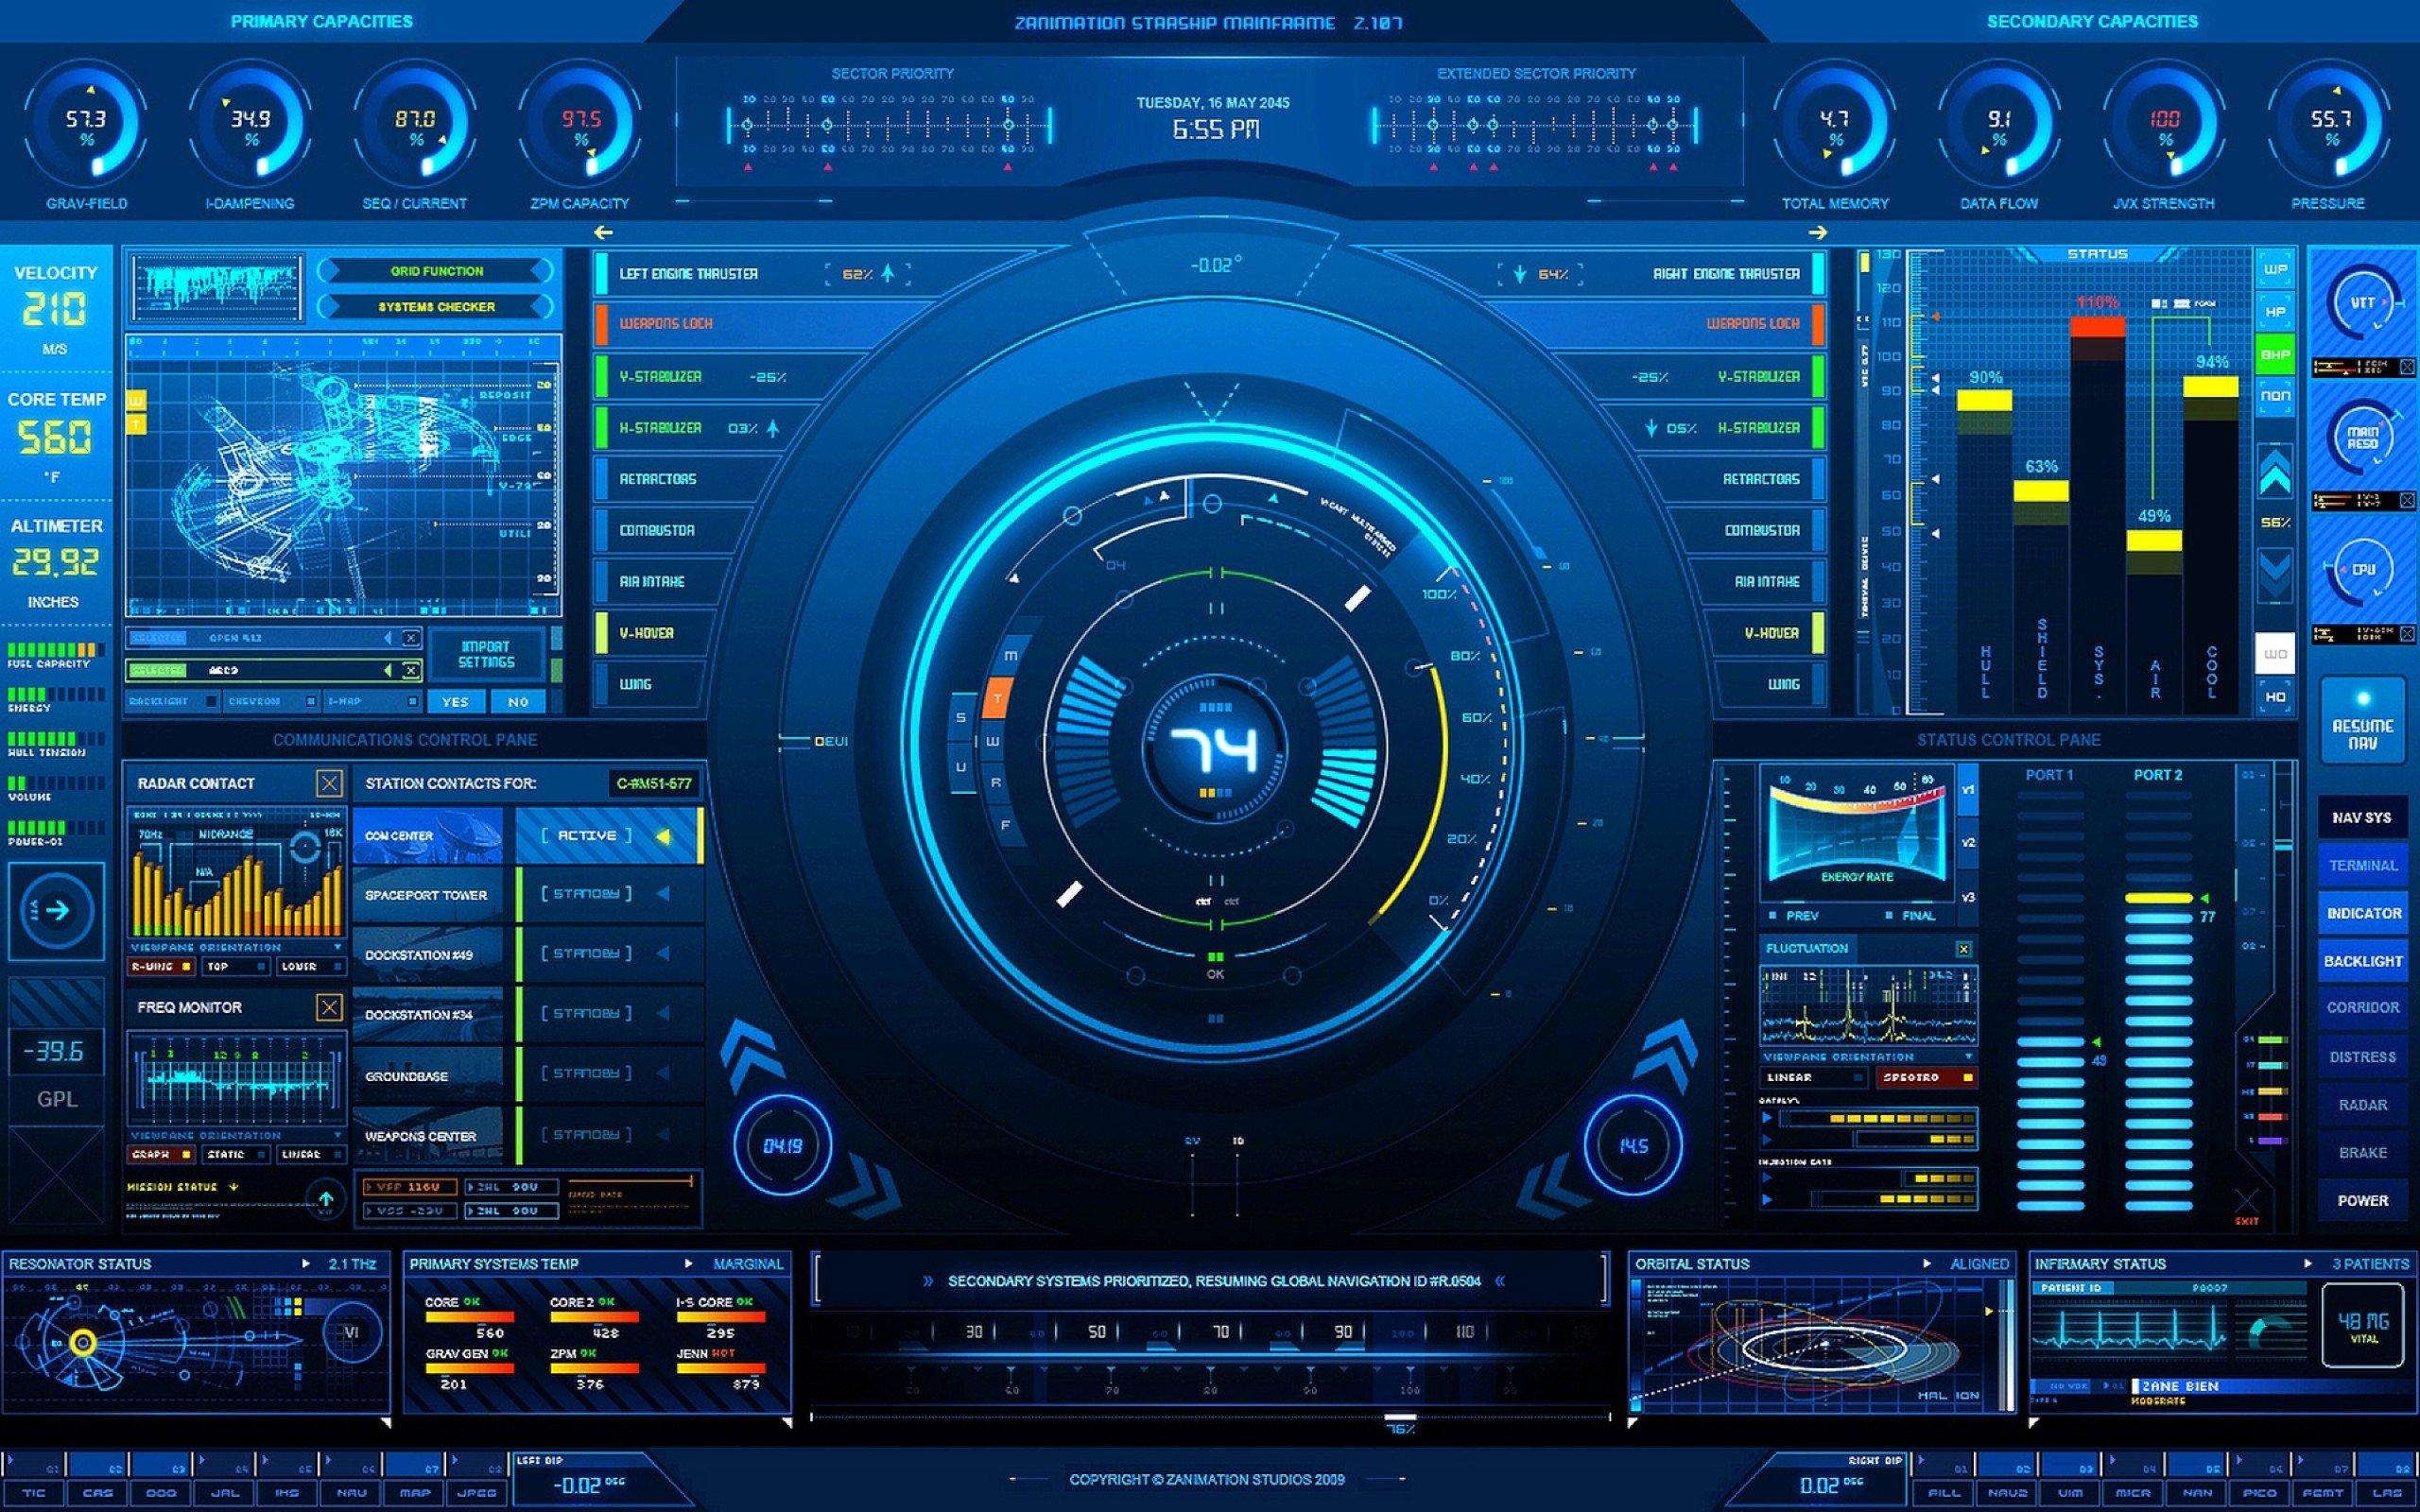 45 Hi Tech Wallpapers For Desktop and Laptops 2560x1600